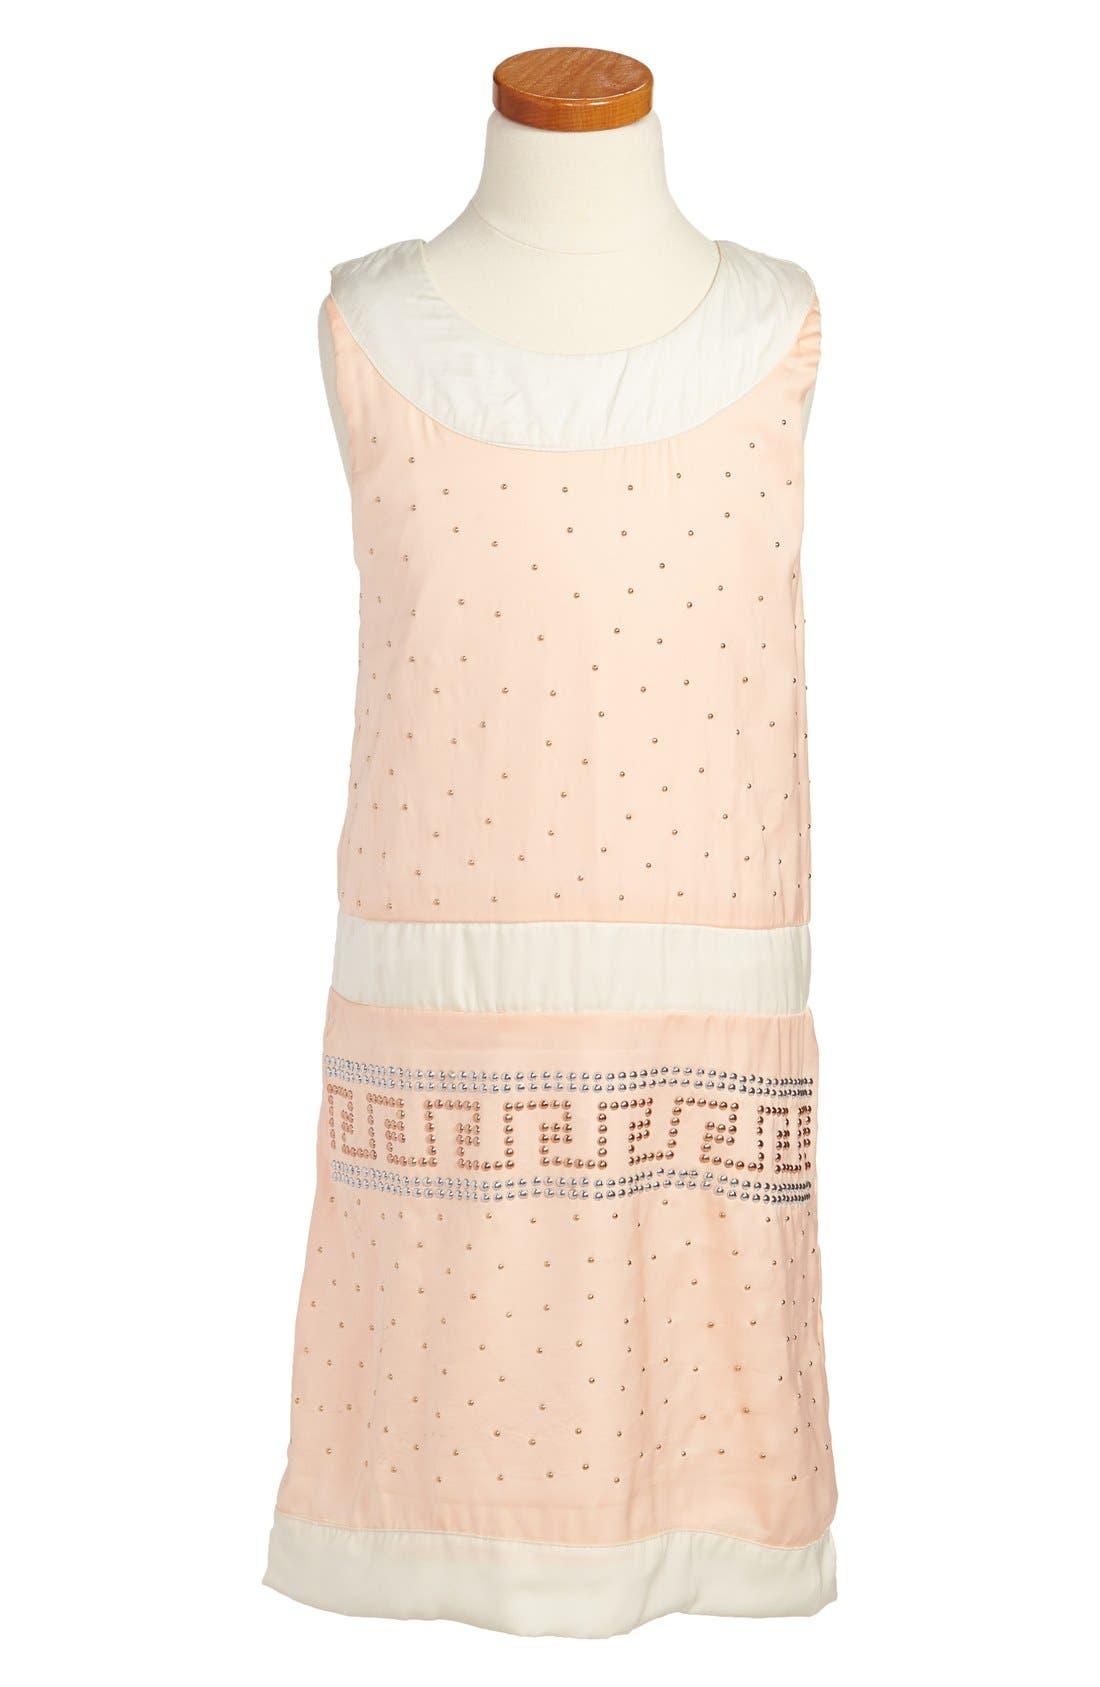 Alternate Image 1 Selected - Laundry by Shelli Segal 'Catherine' Sleeveless Studded Dress (Big Girls)